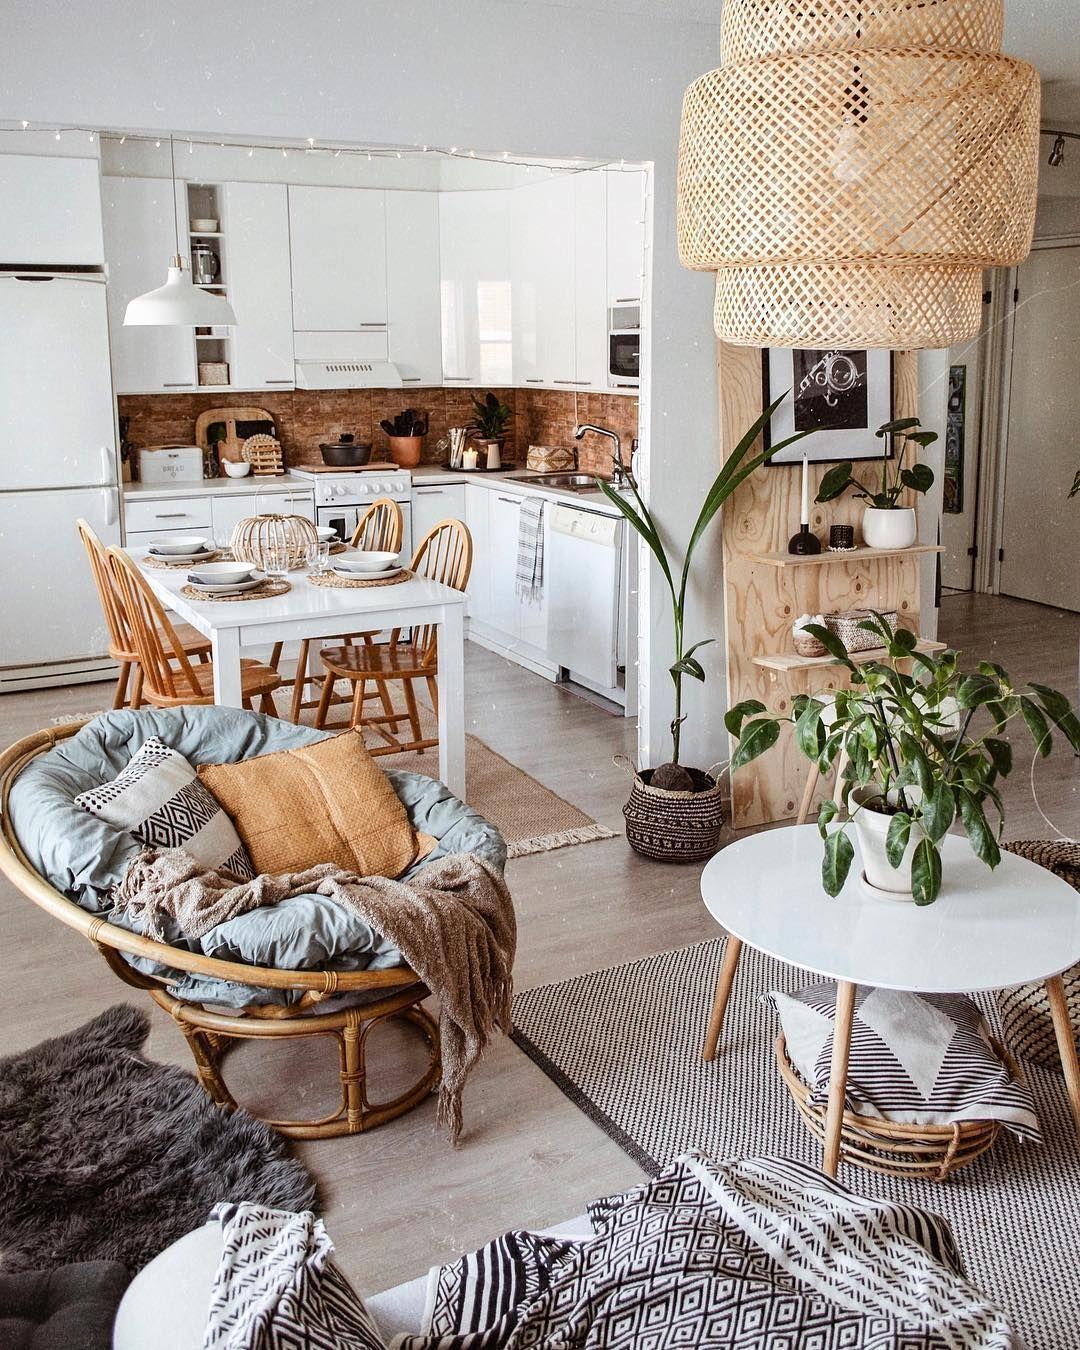 36 Amazing Papasan Chair Design Ideas For Your Living Room Bohem Tasarim Modern Ic Mekanlar Dekor